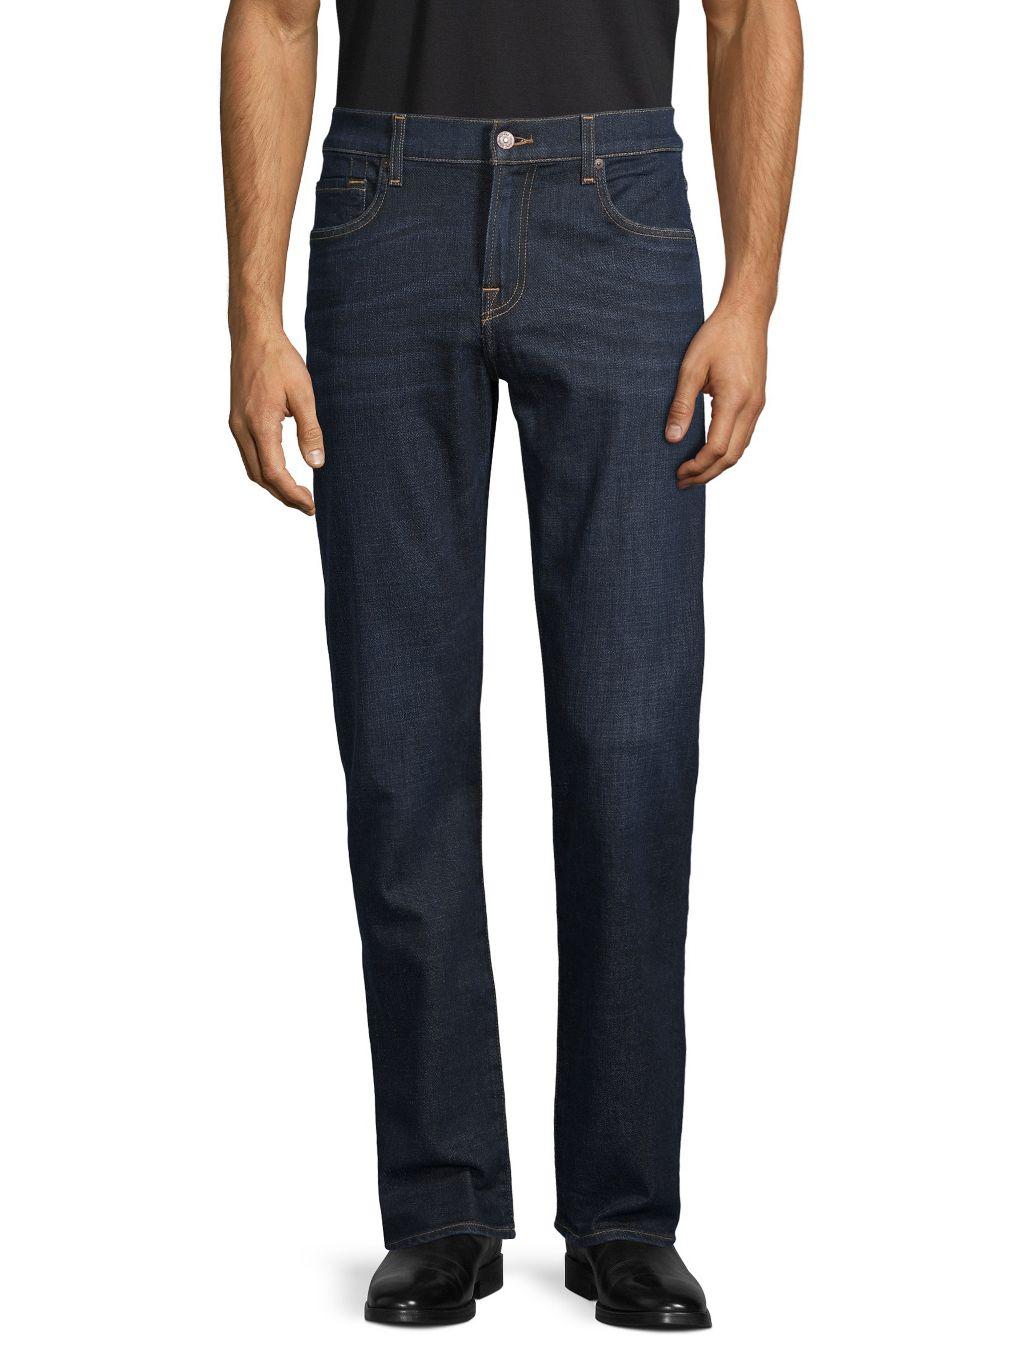 7 For All Mankind Series 7 Denim Slim Slimmy Jeans